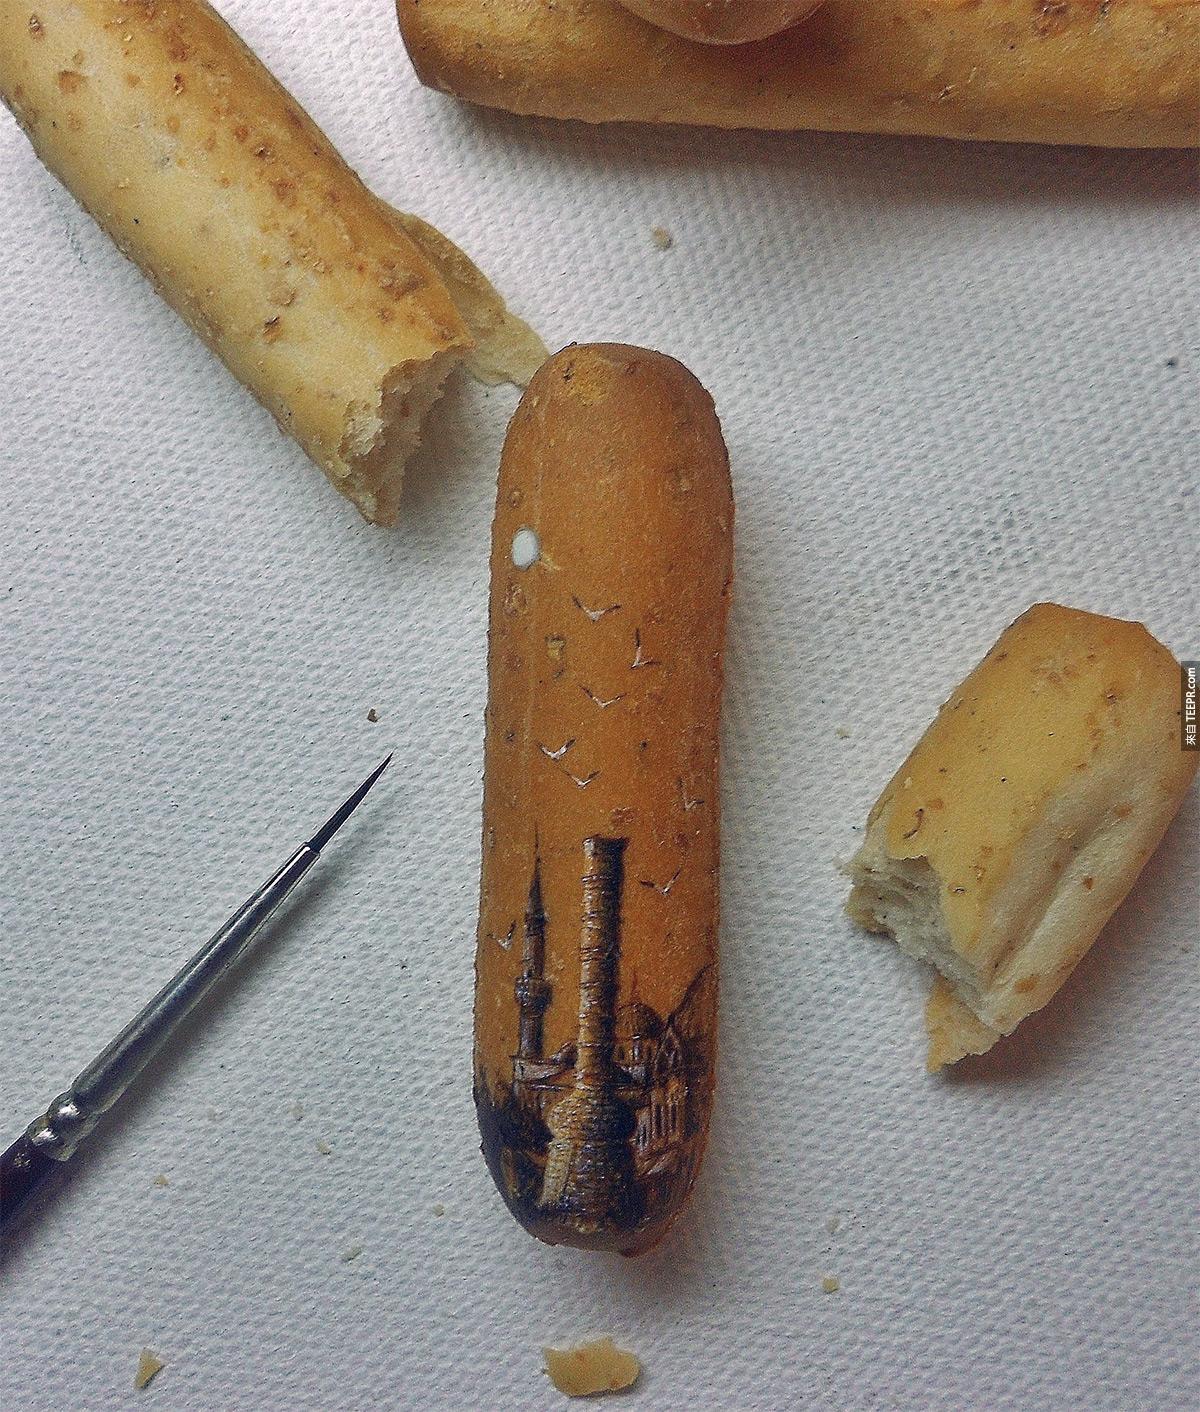 7.) Breadstick